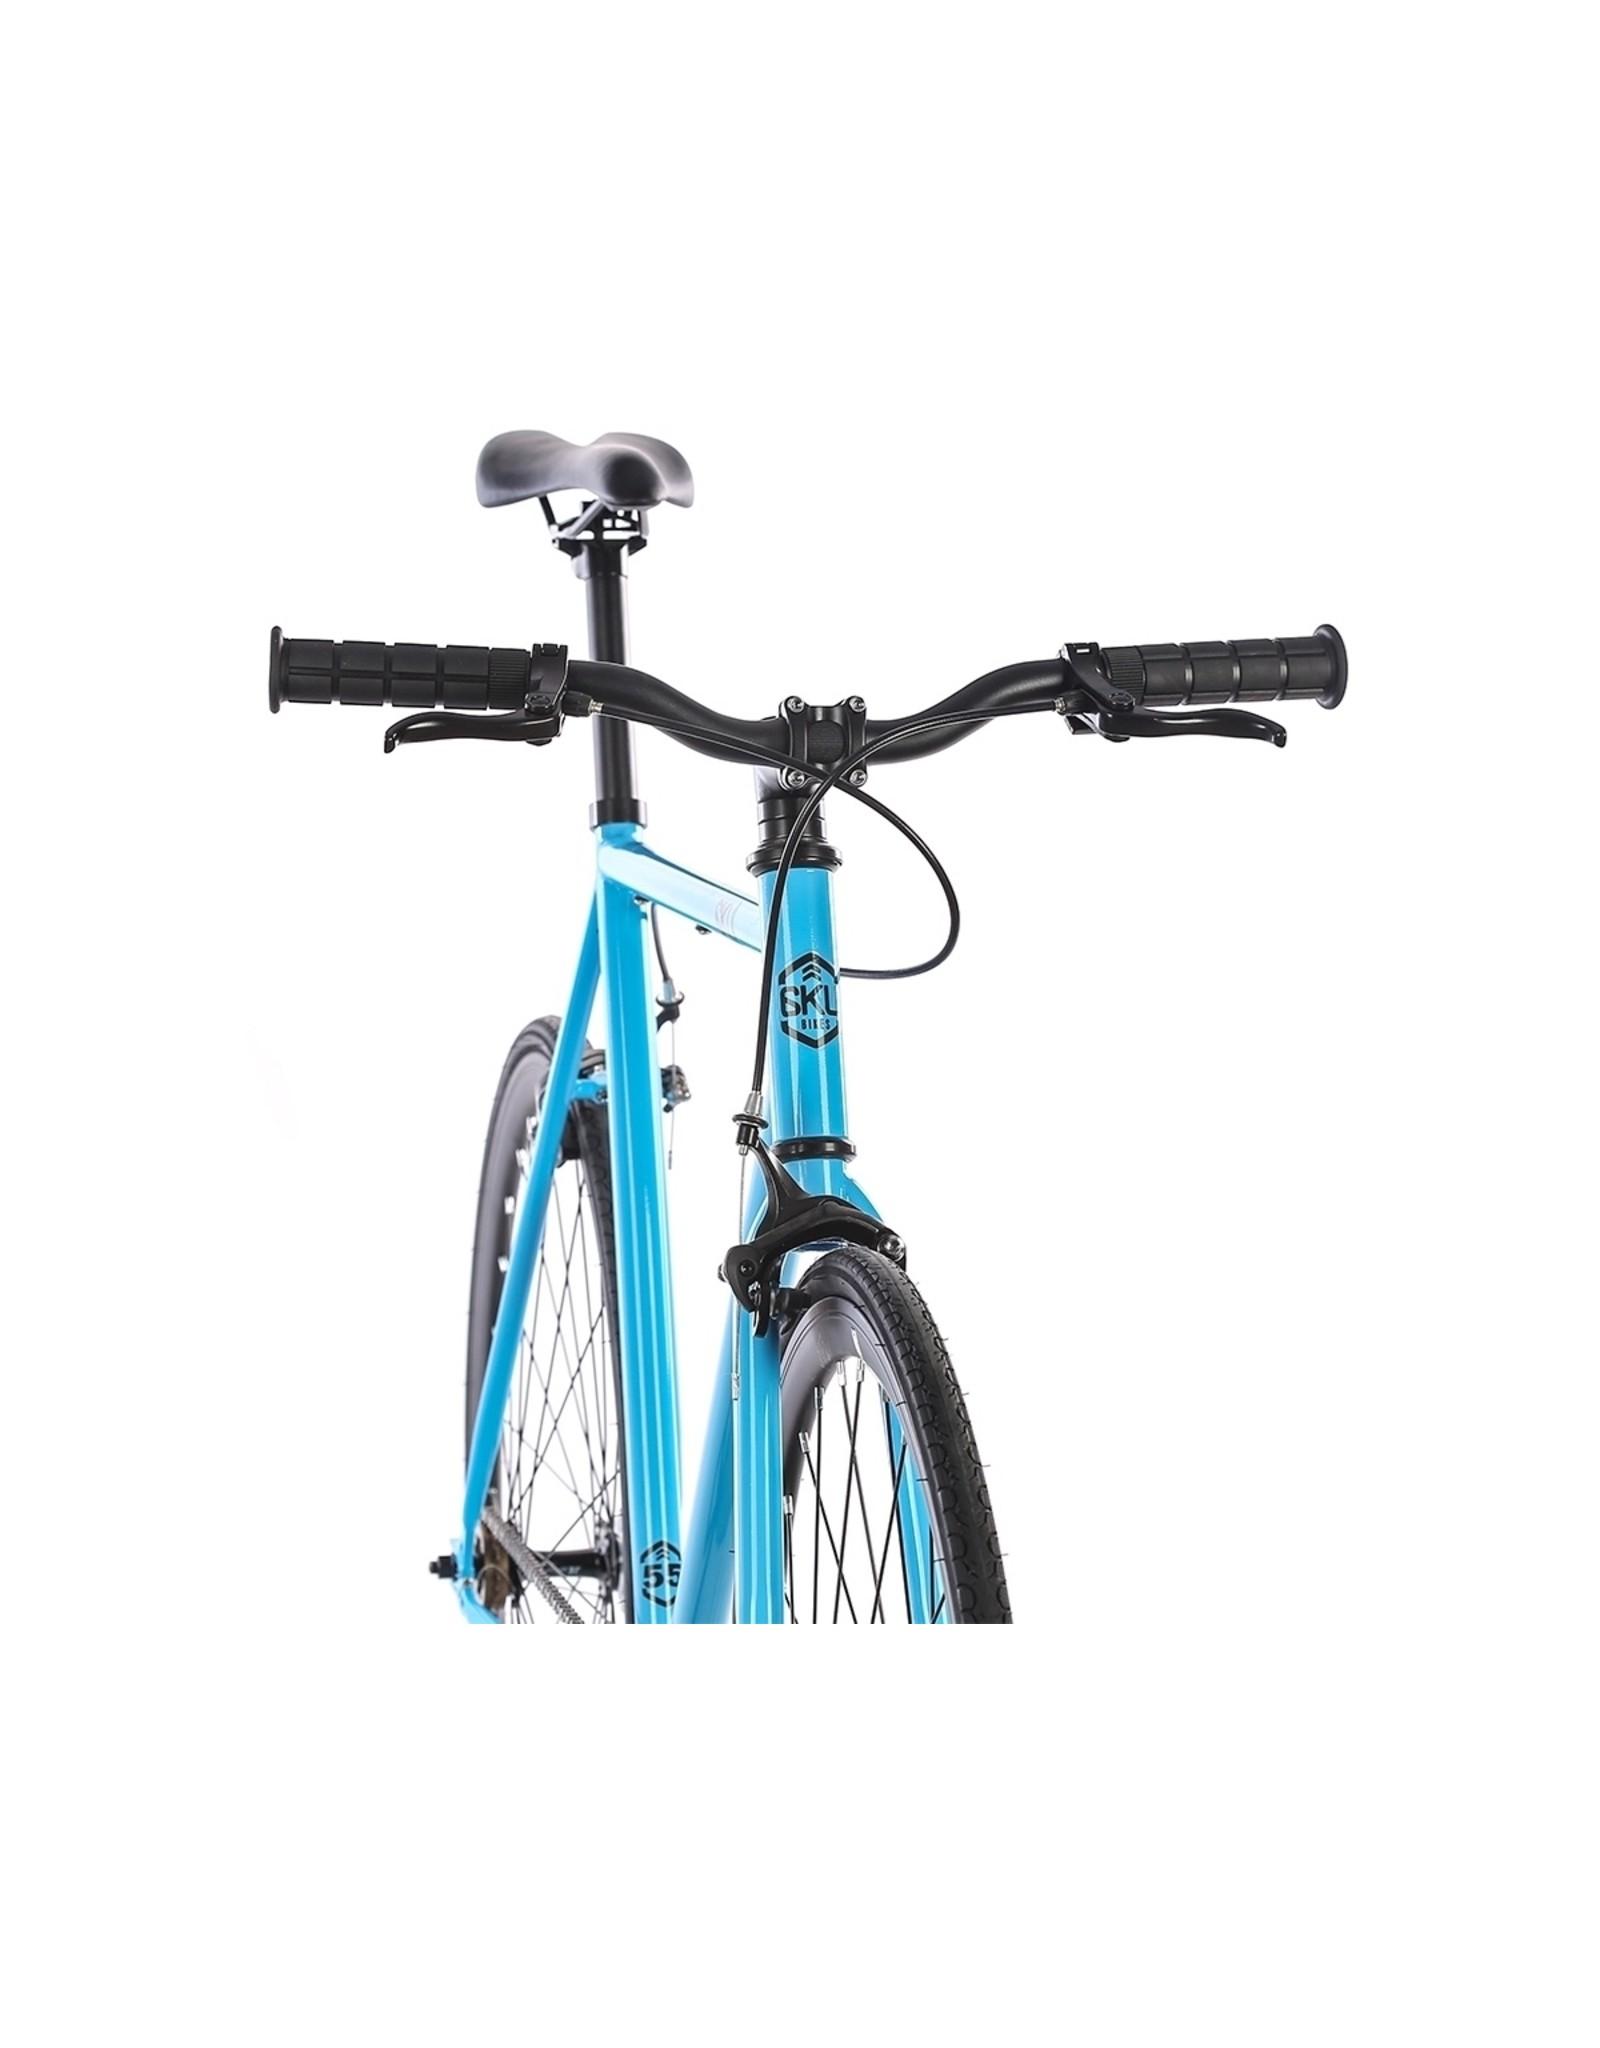 2018 6KU Fixie & Single Speed Bike - IrisSize:52cm blue / black wheels